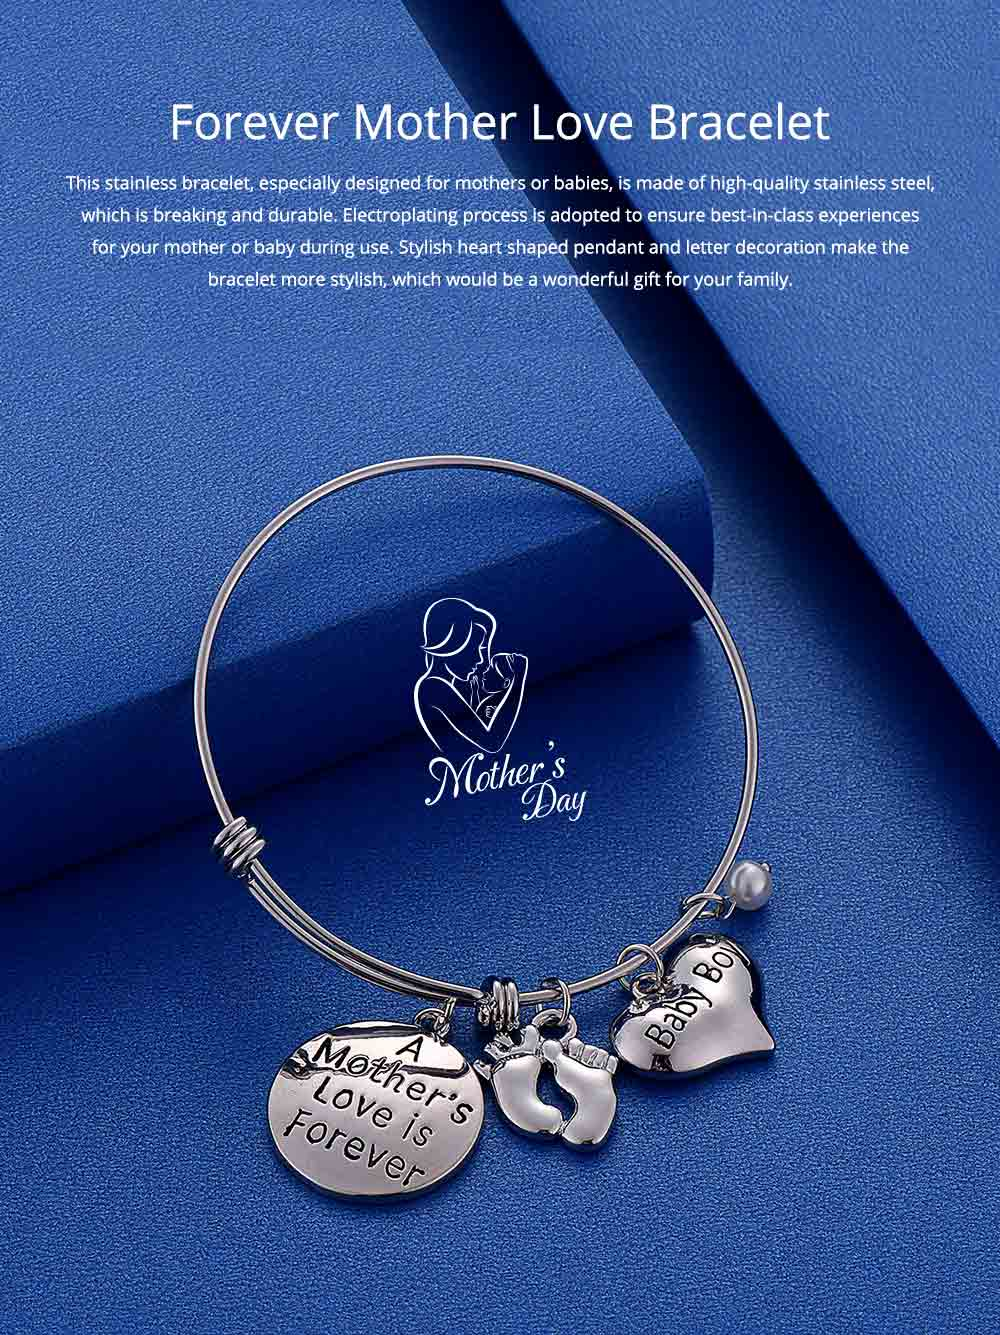 Heart Shaped Stainless Steel Bracelet, Pendant Mother Love Baby Boy Letter Decoration 0